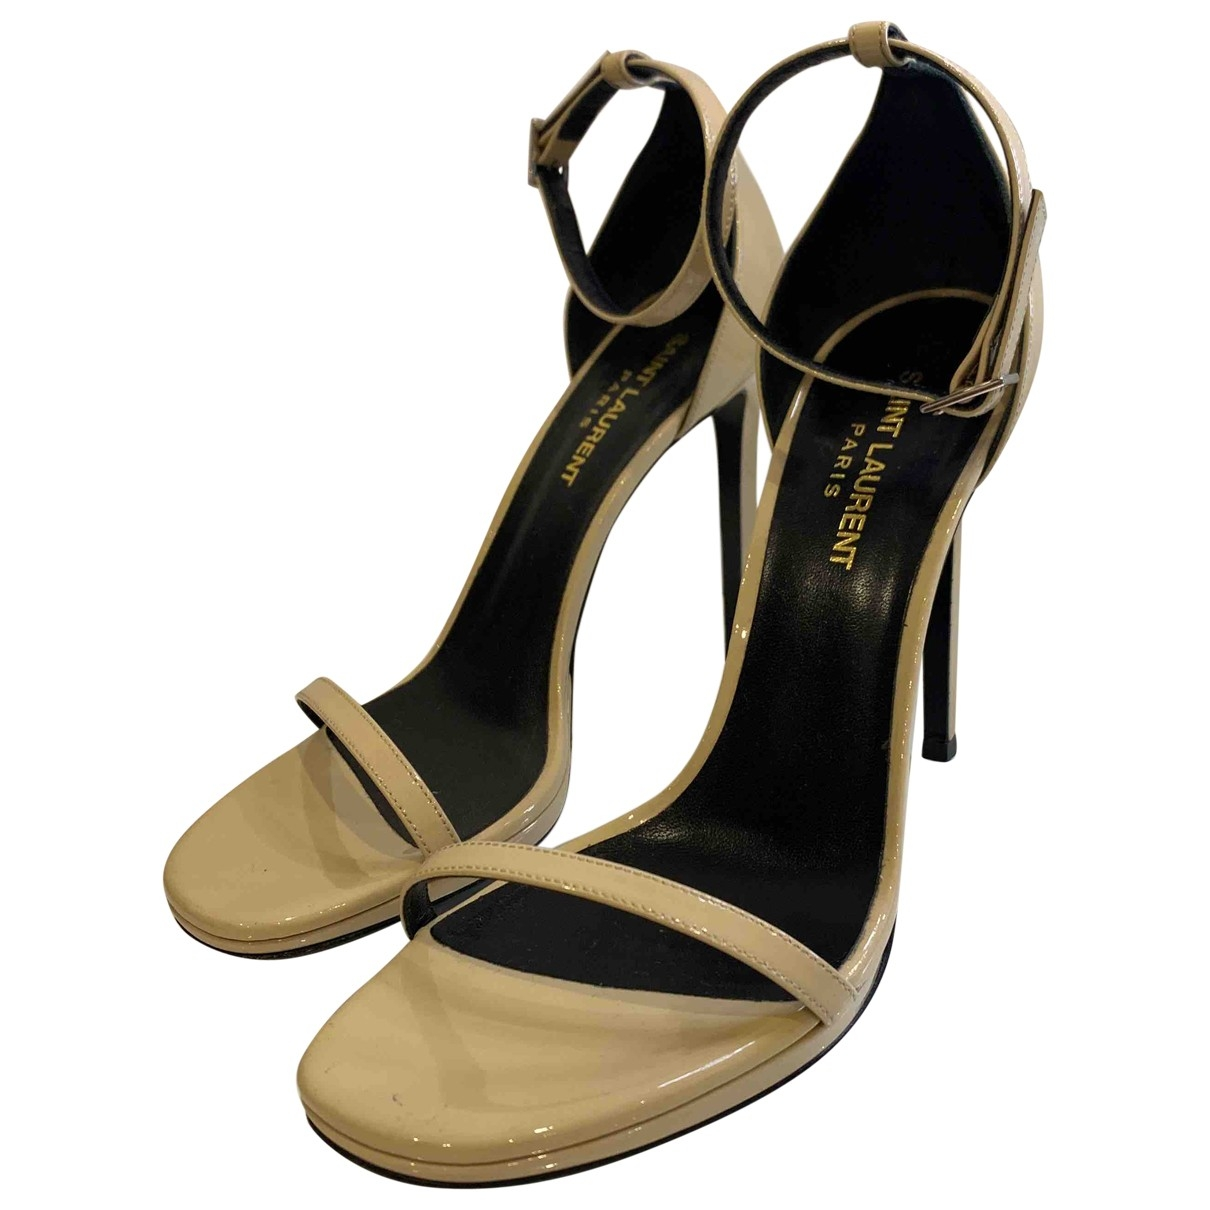 Saint Laurent Amber Beige Patent leather Sandals for Women 37 EU